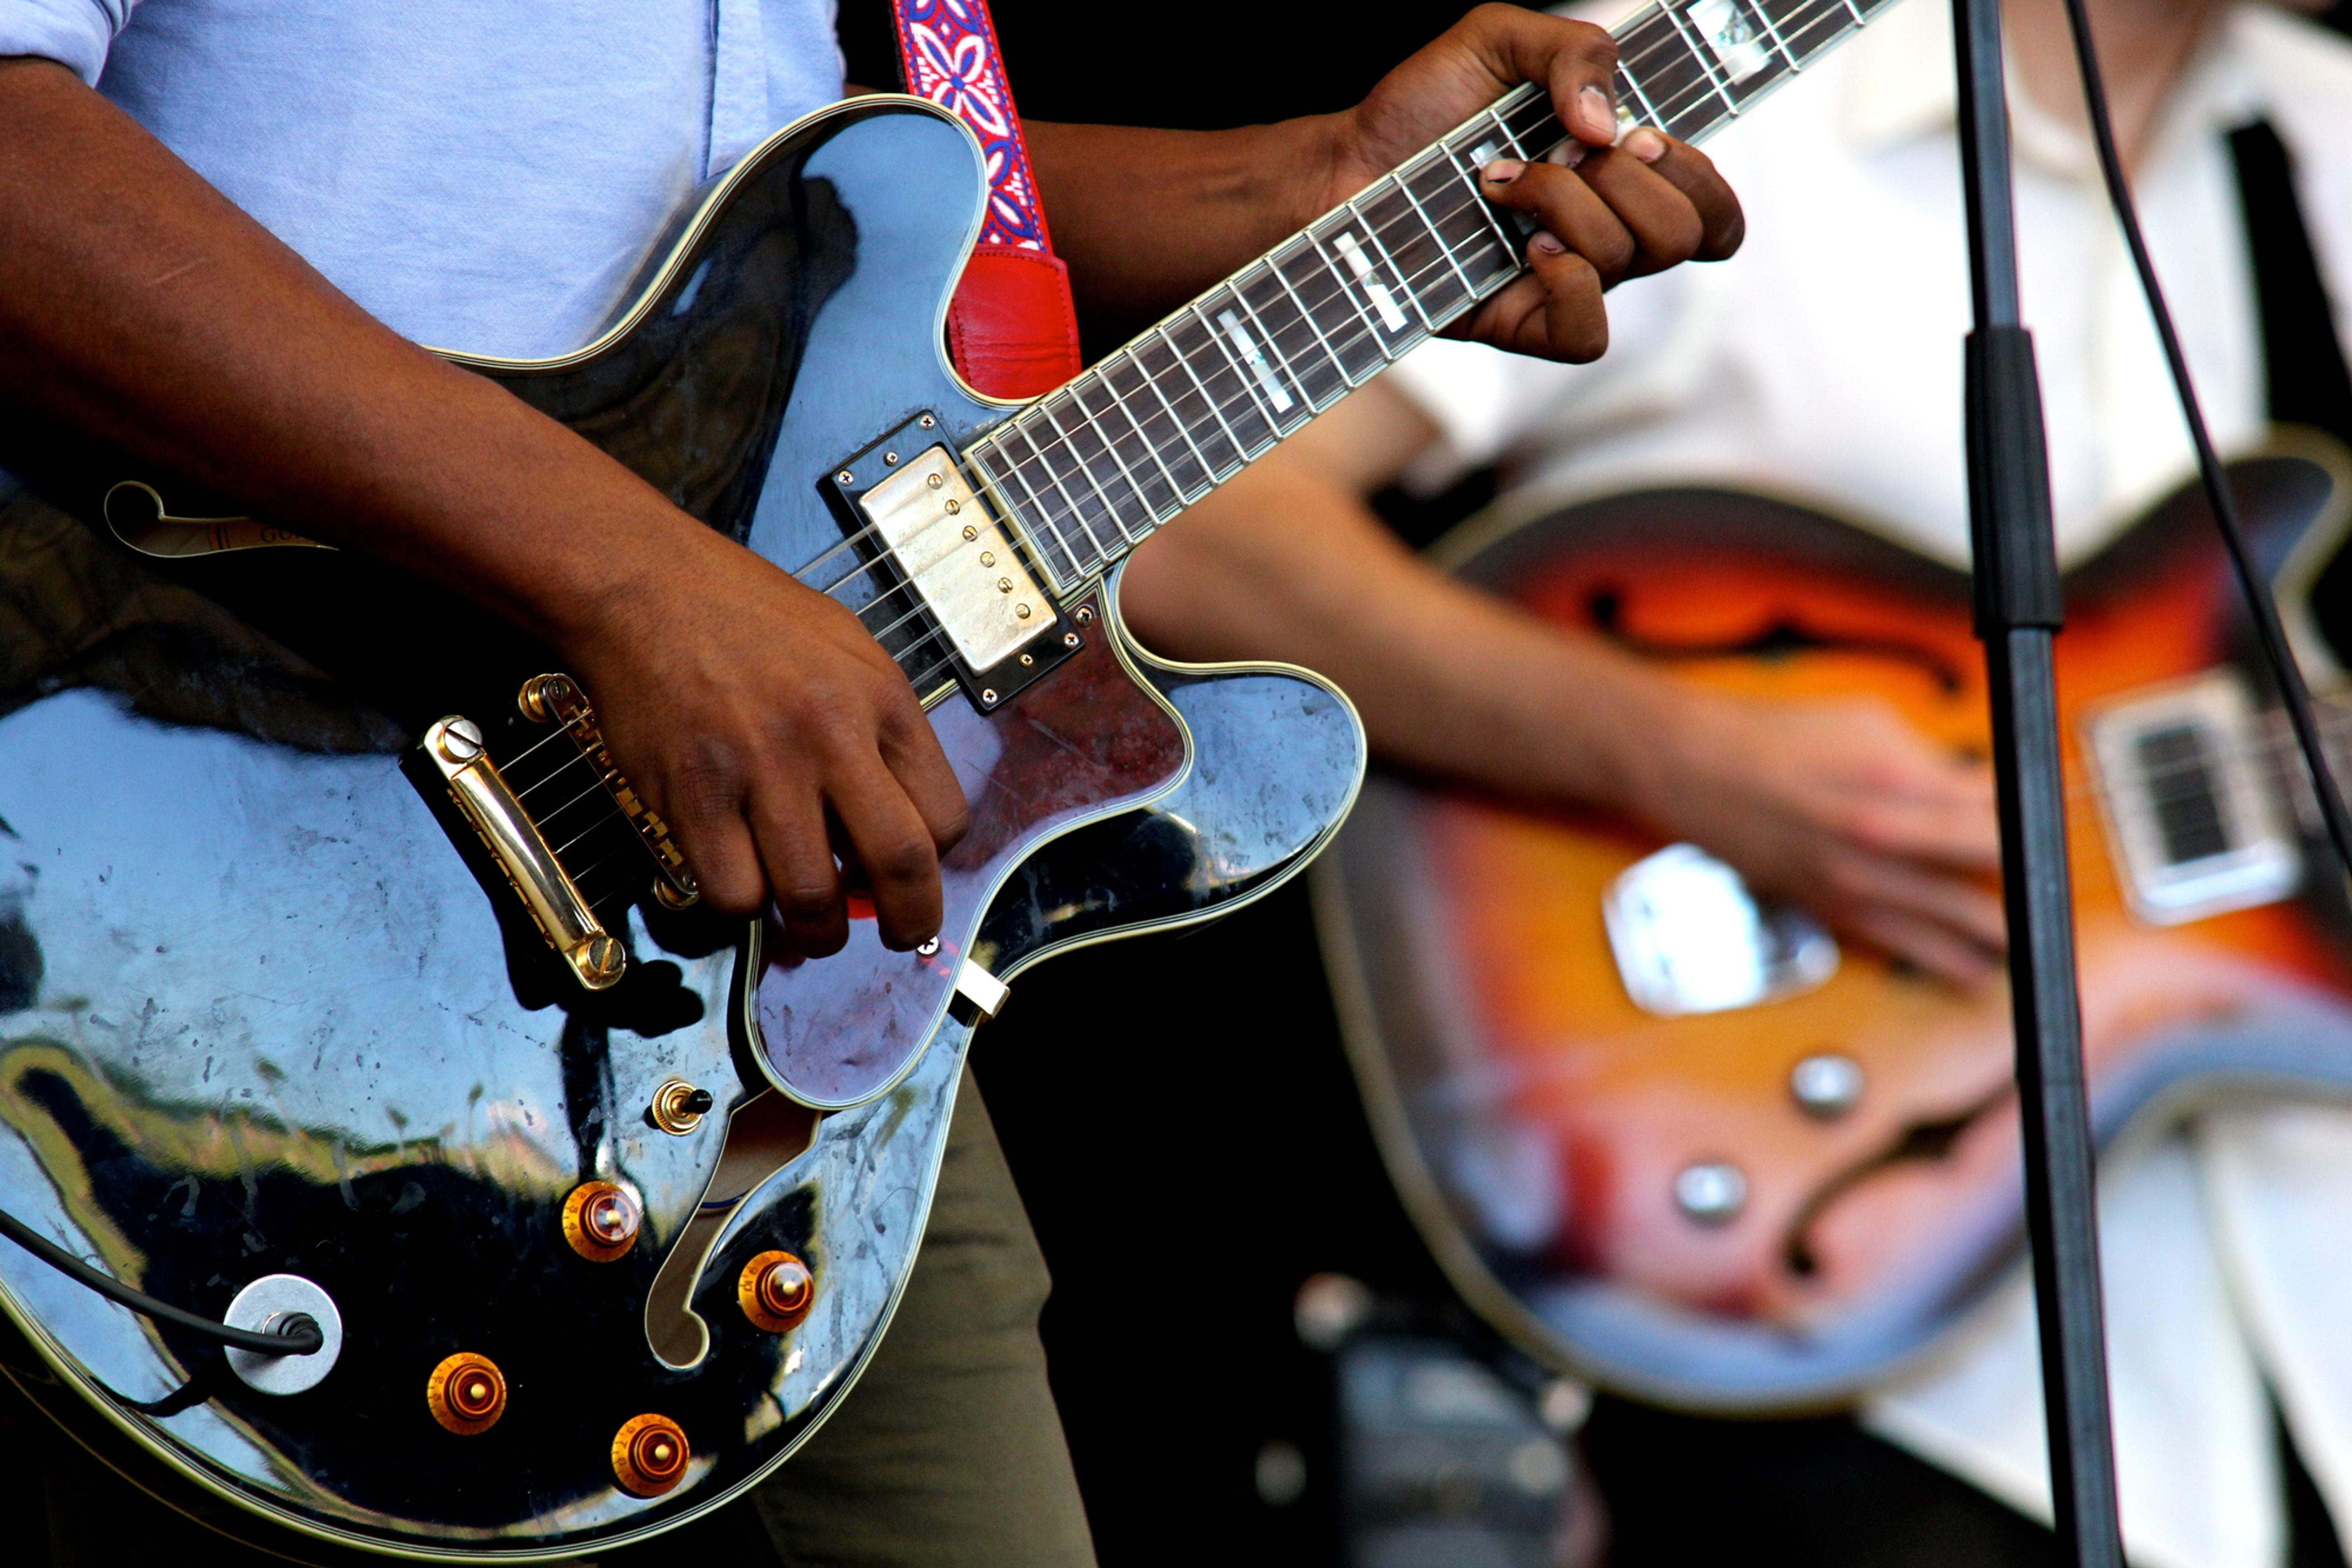 Basic Guitar I